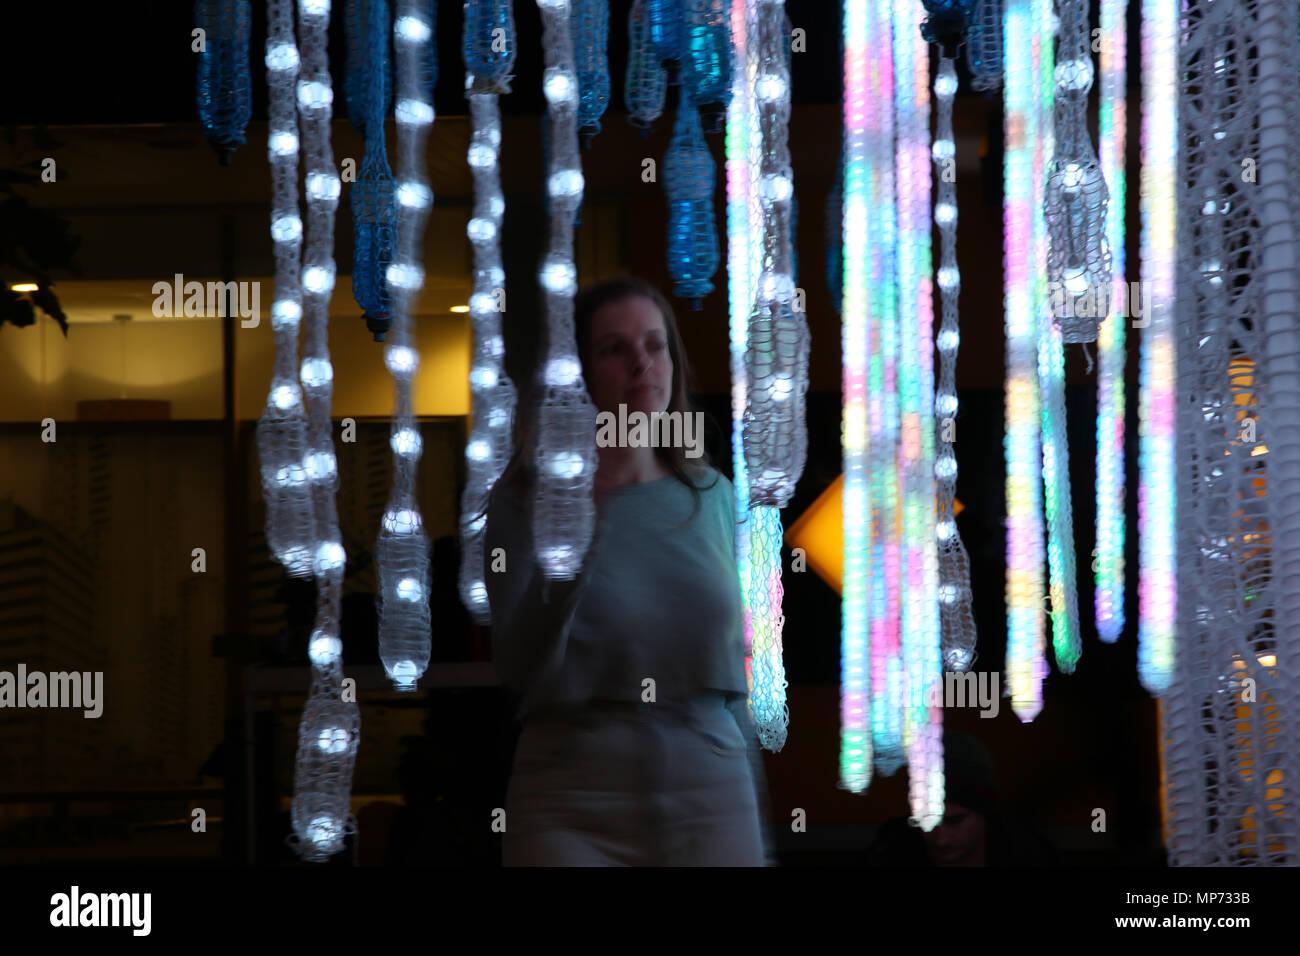 Sydney, Australia. 21 May 2018. The Vivid Sydney Festival of Light